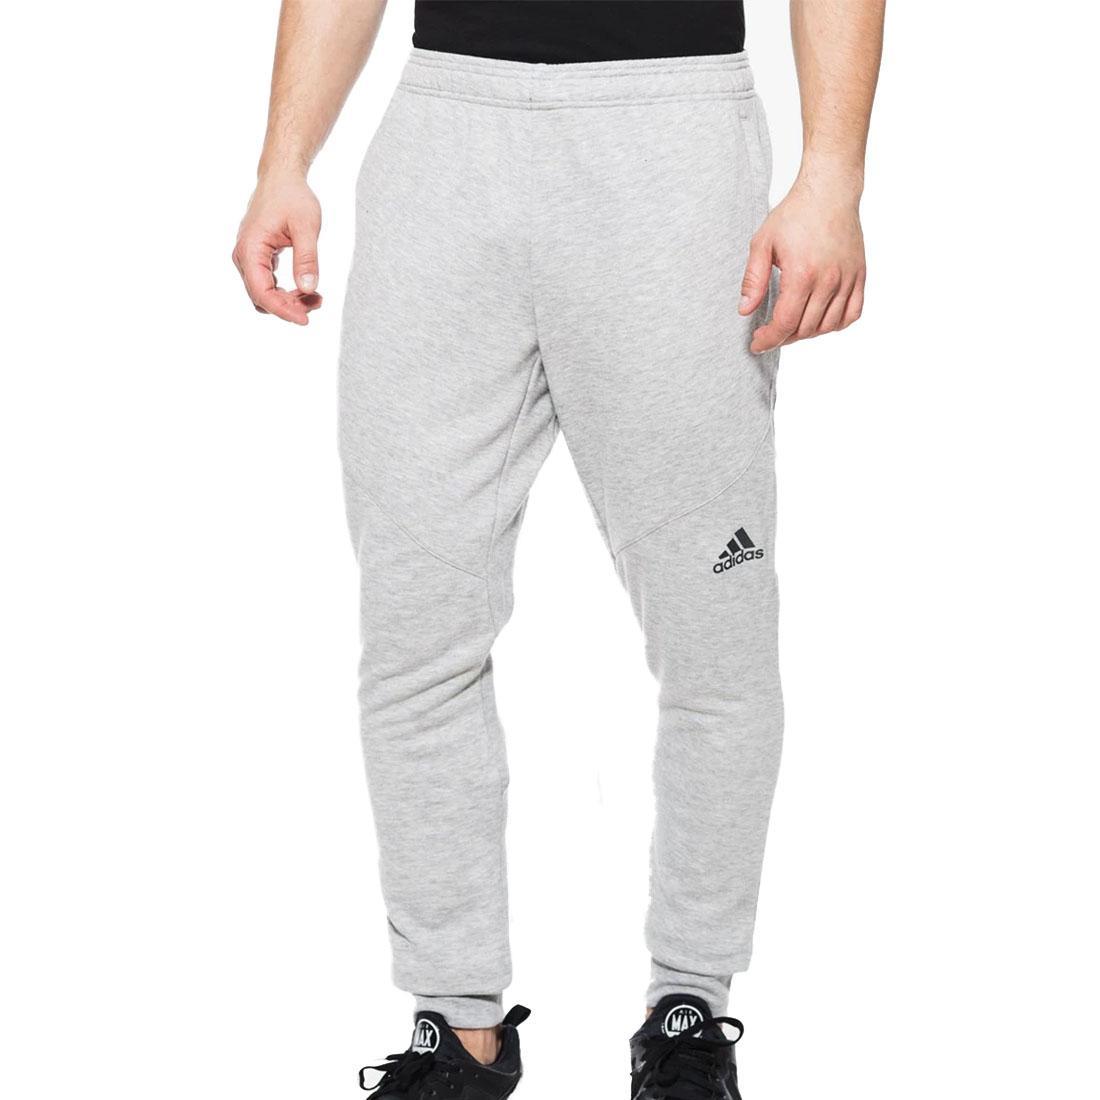 adidas bellista pantaloni